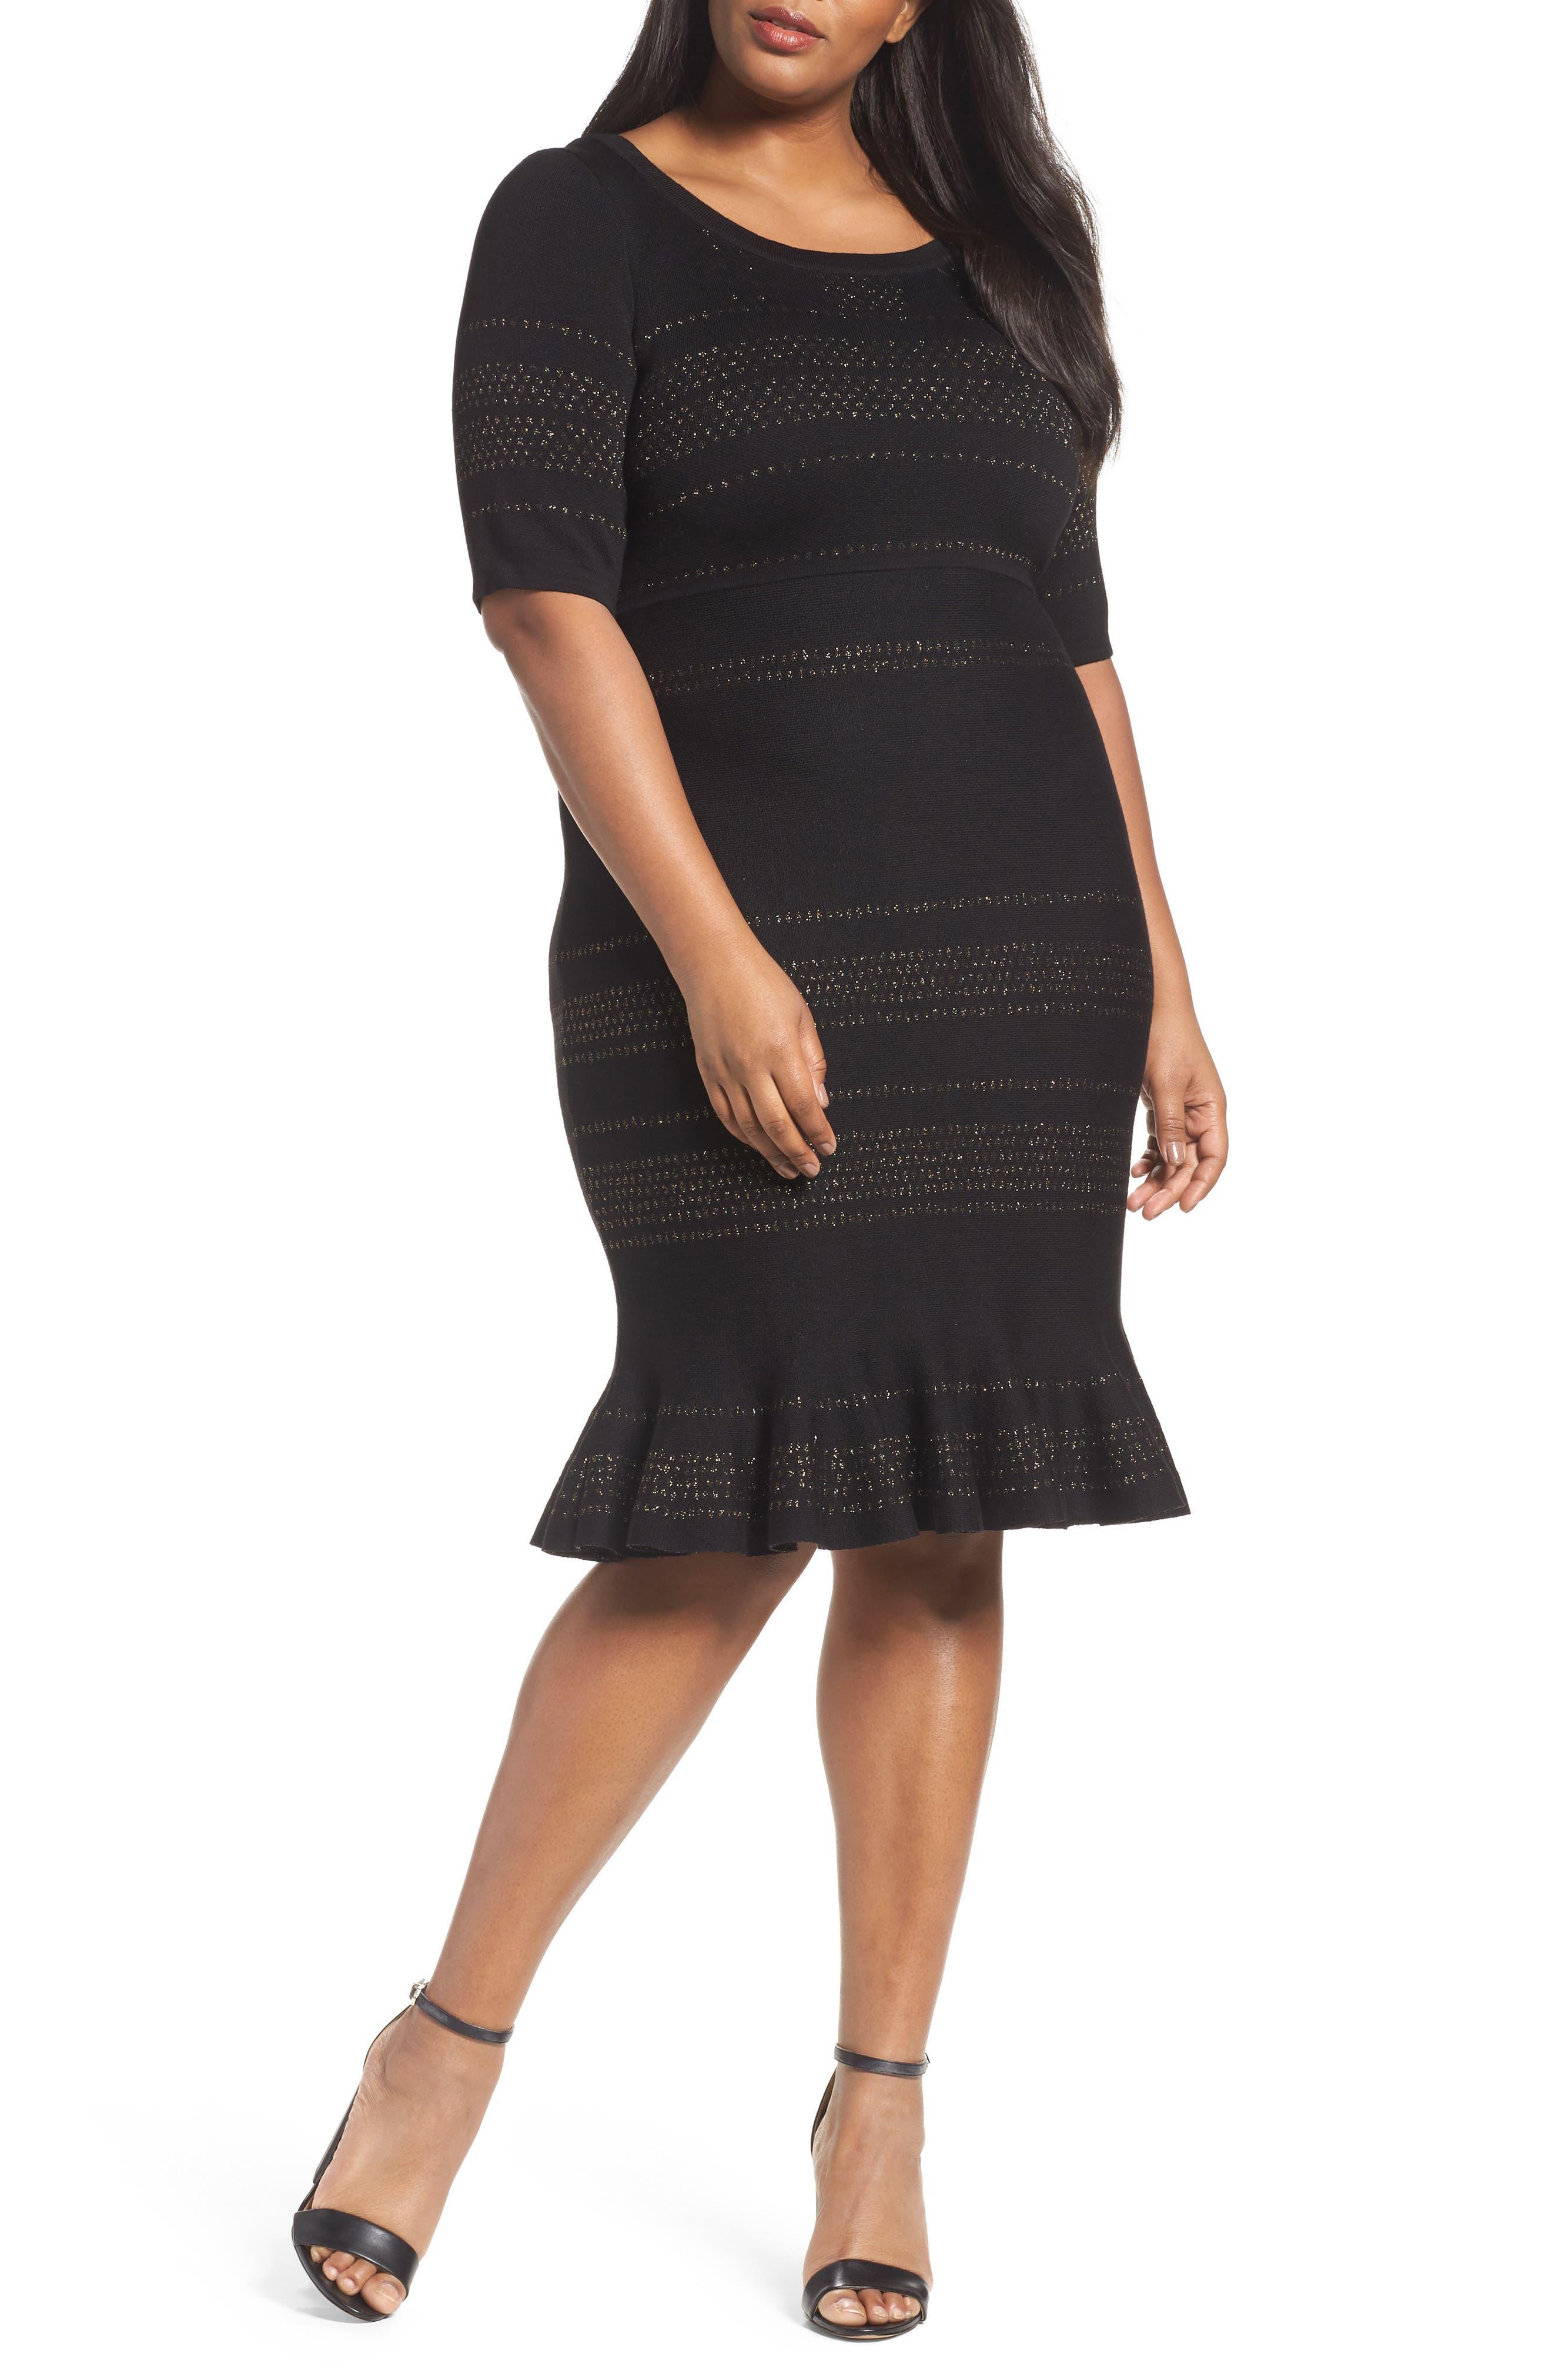 Taylor Dresses Metallic Knit Dress (Plus Size)